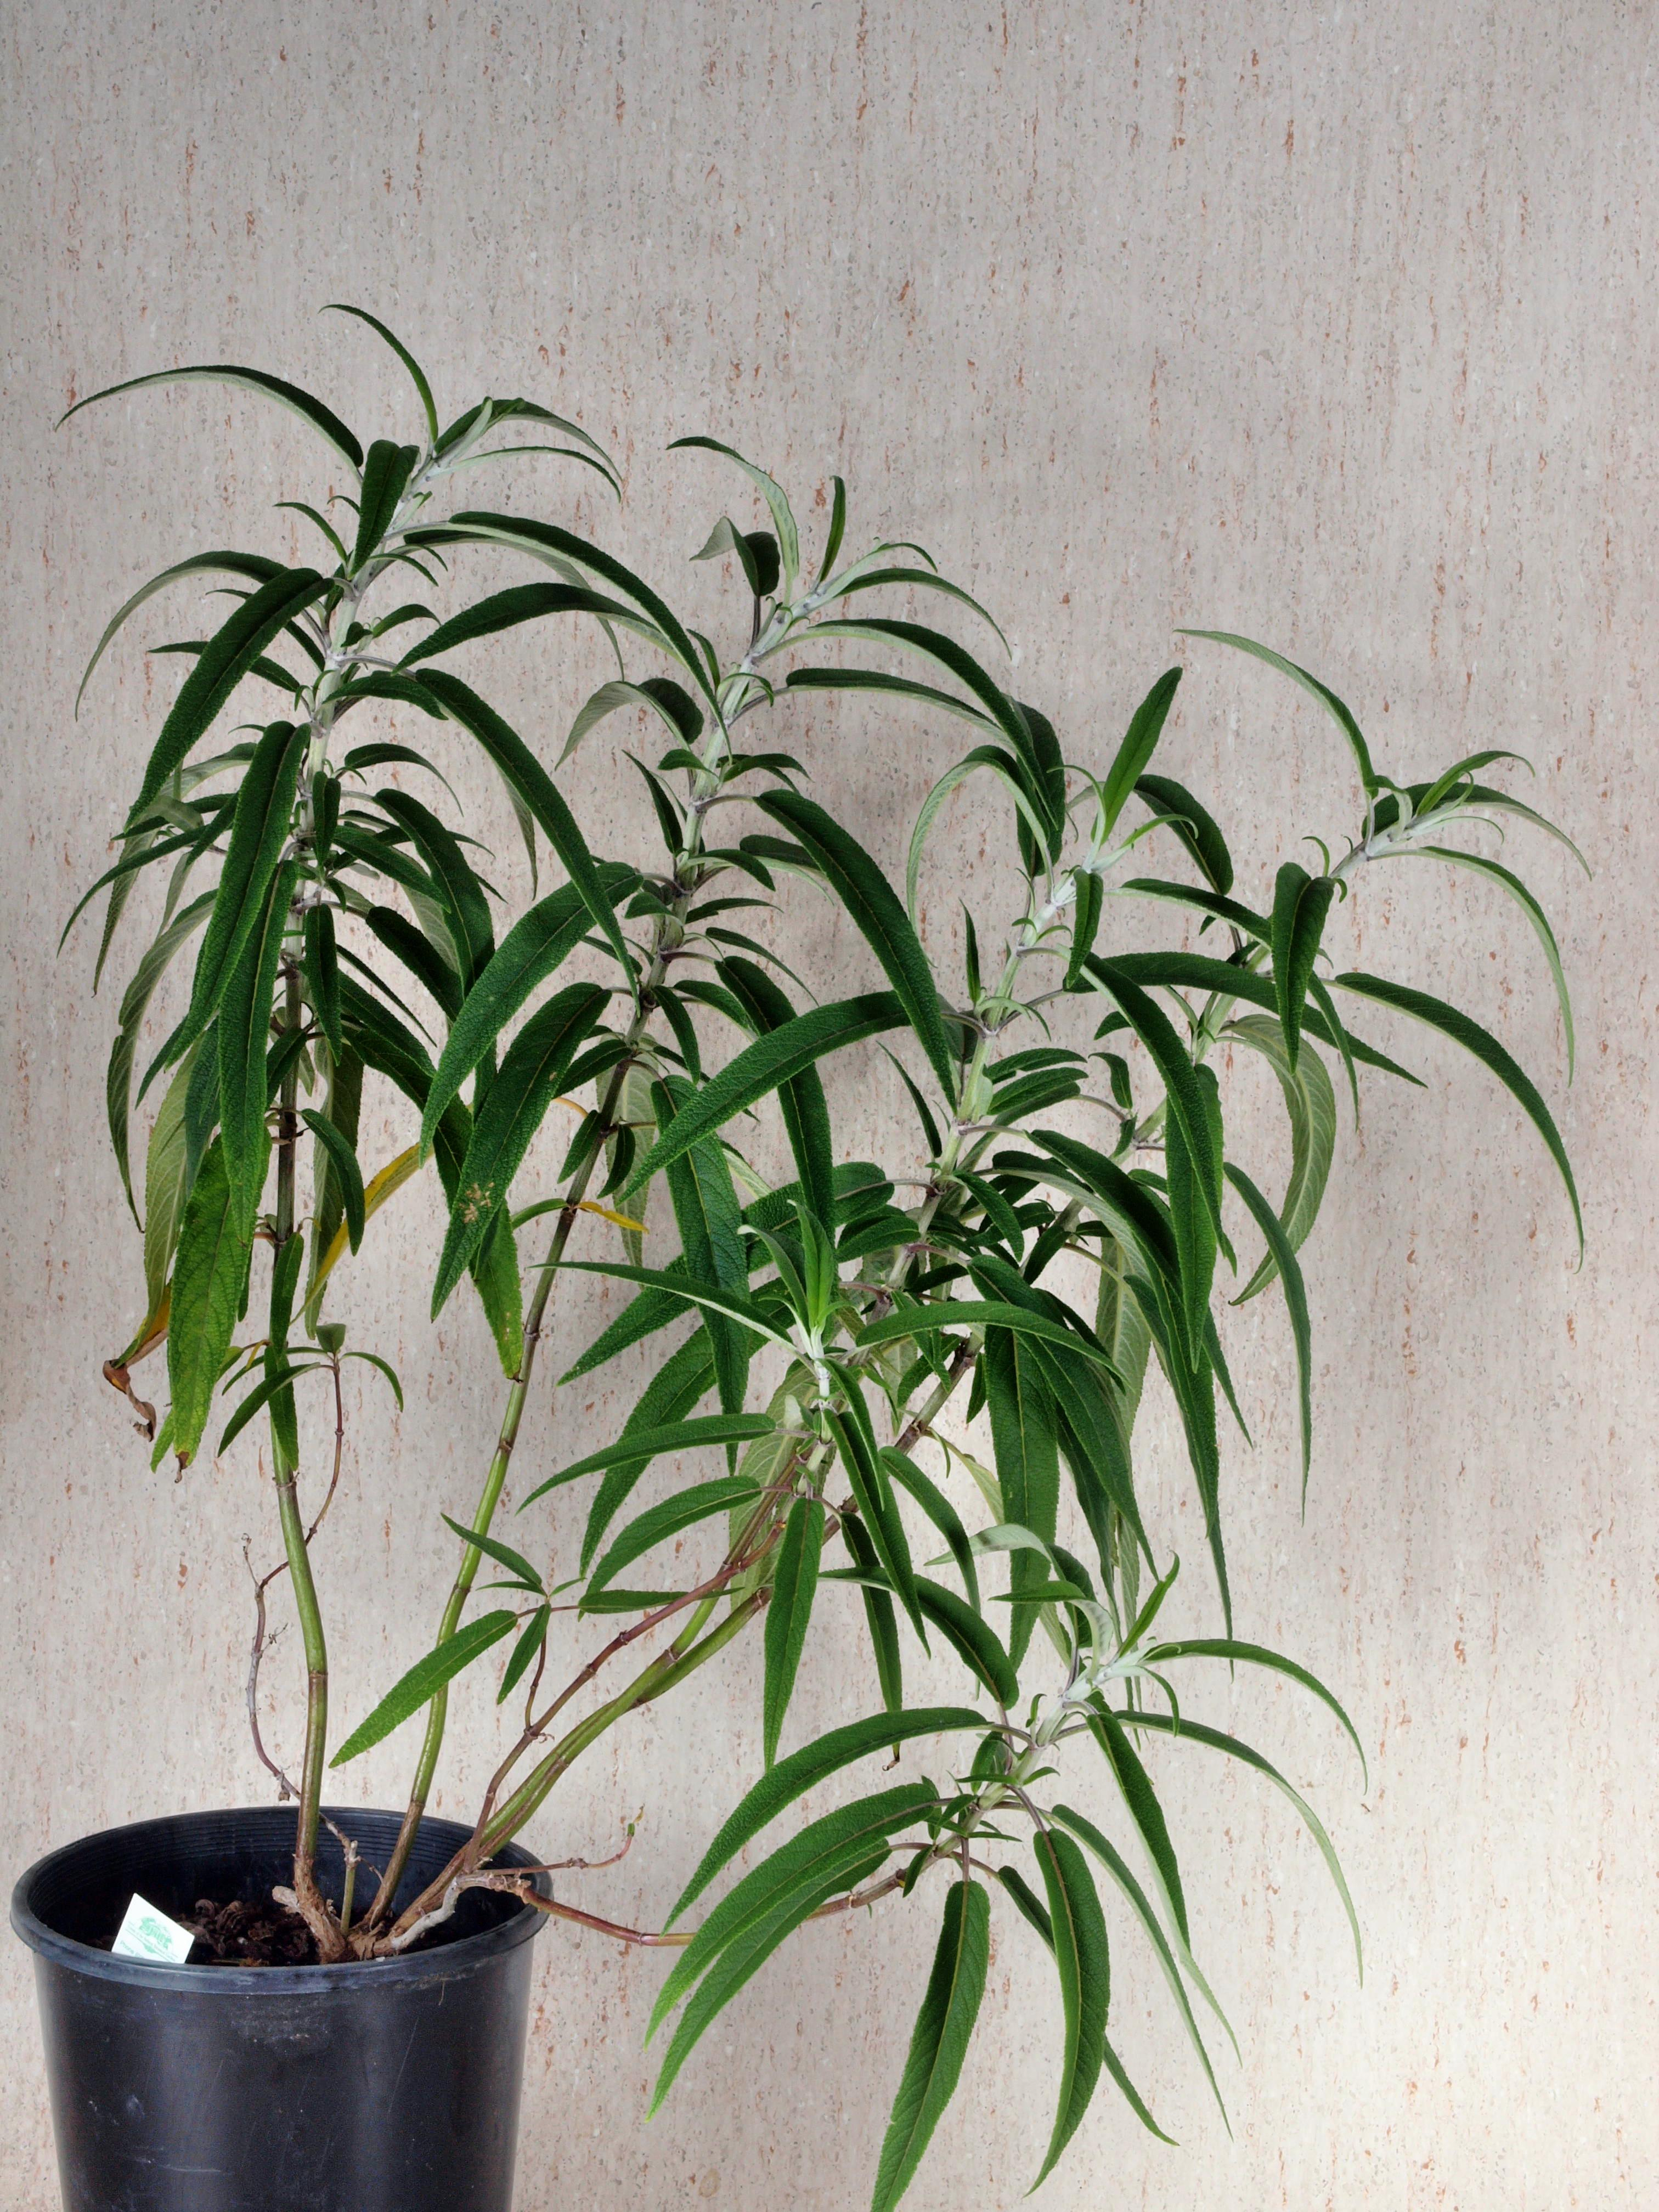 Salvia-leucantha-2.jpeg